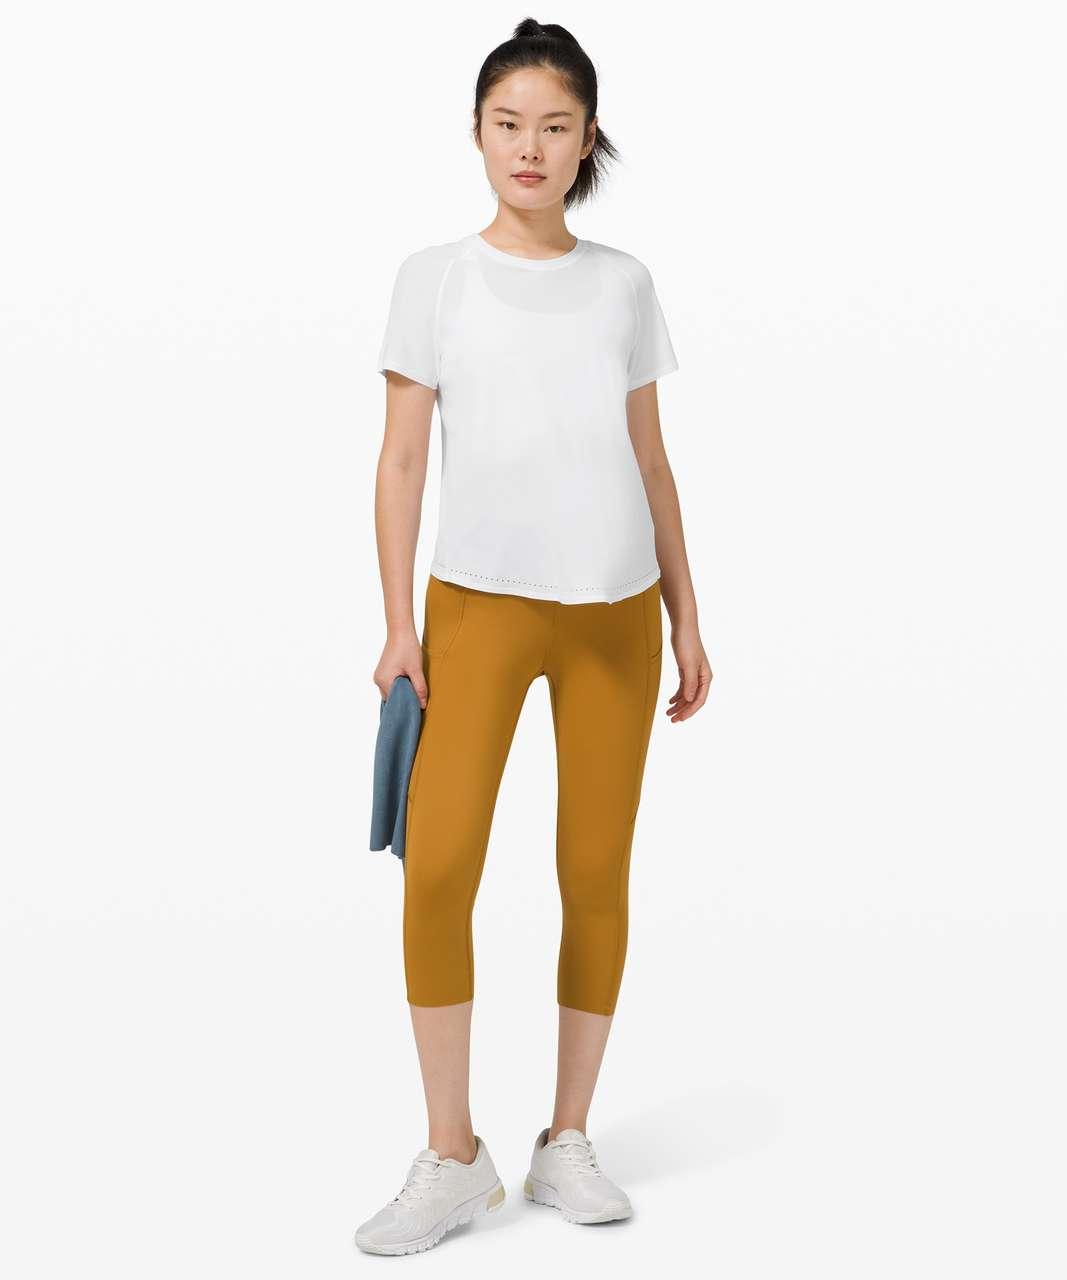 Lululemon Rise and Run Short Sleeve - White